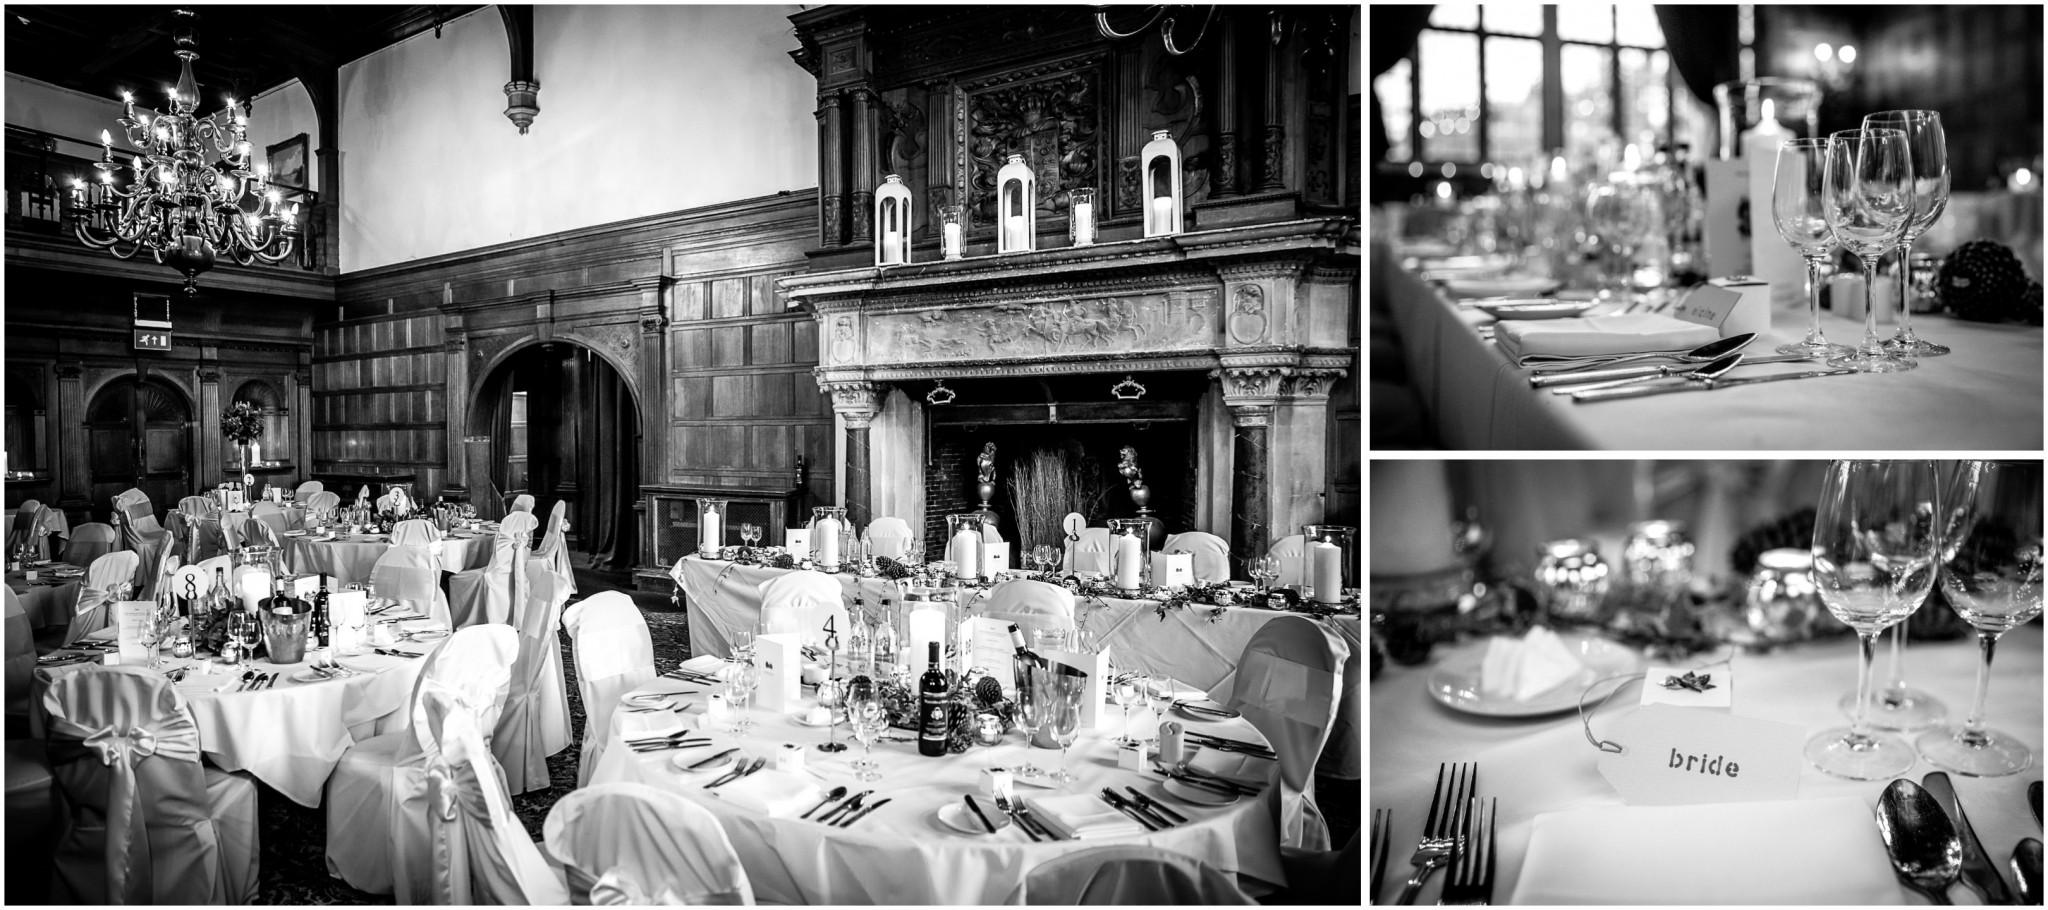 Rhinefield House Wedding Breakfast Banqueting Hall